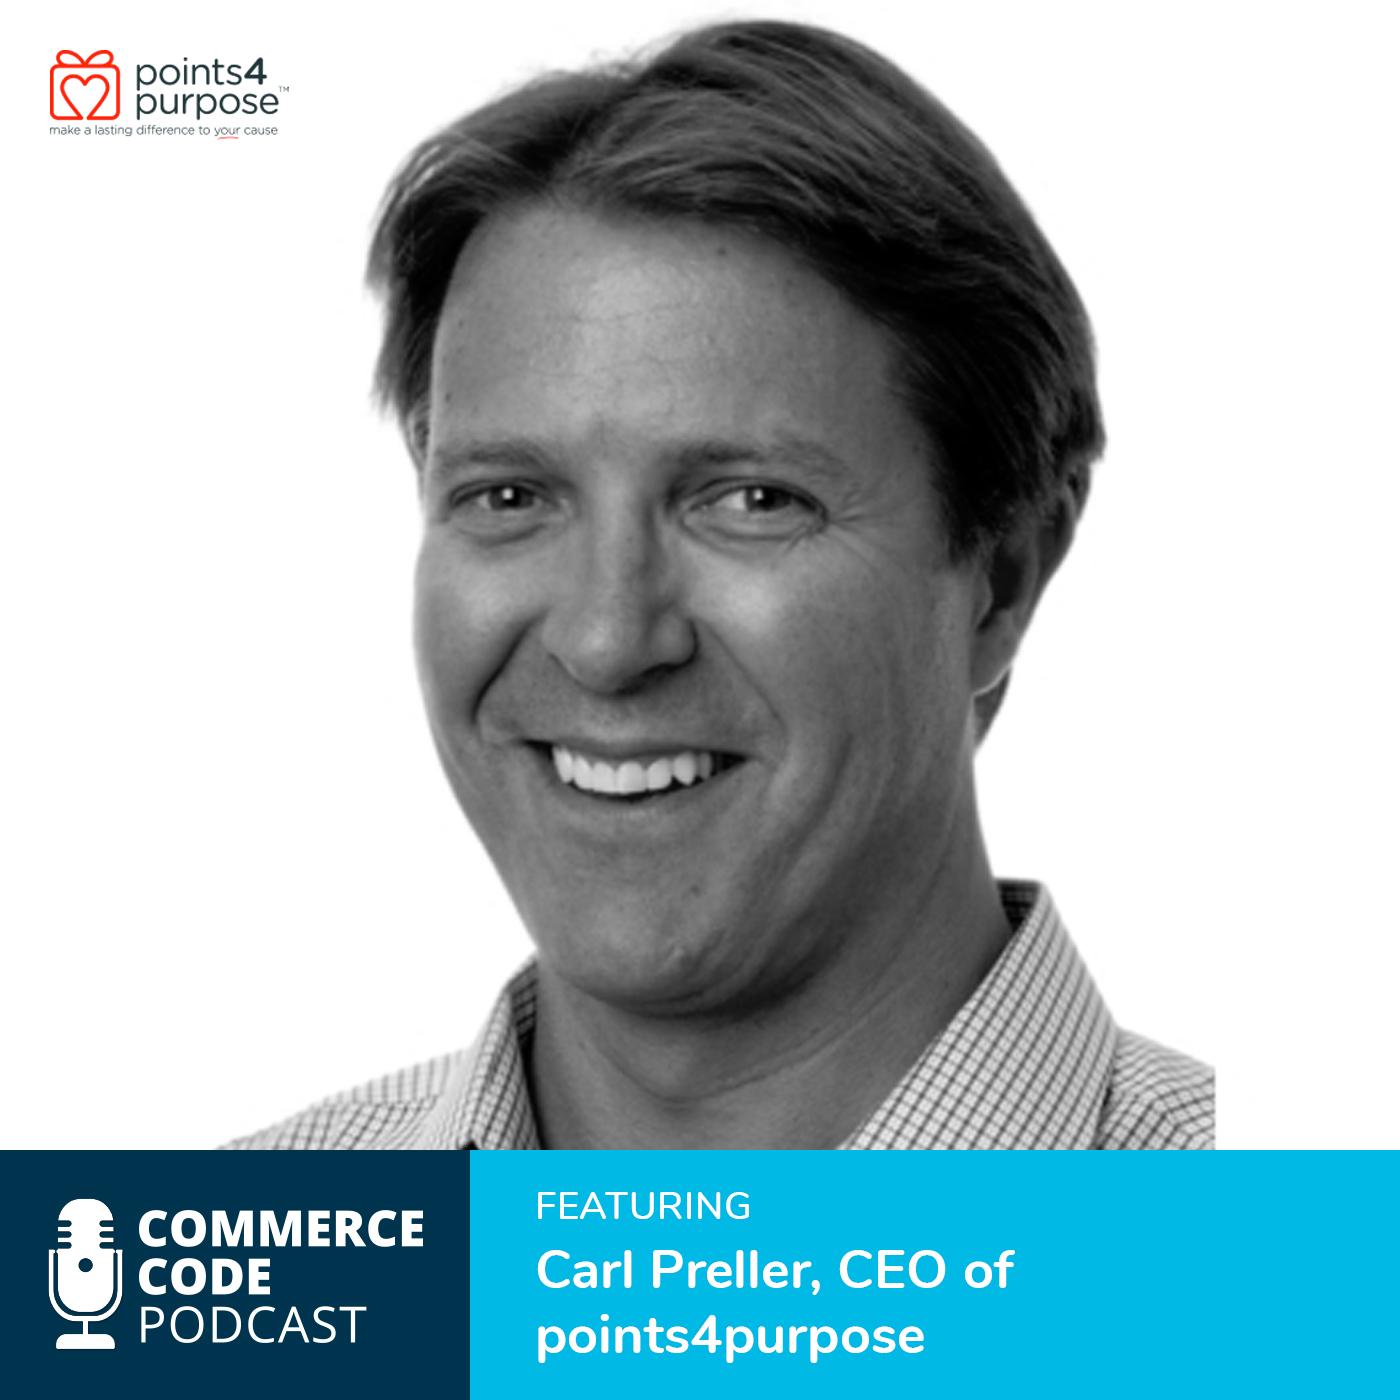 commerce code carl preller